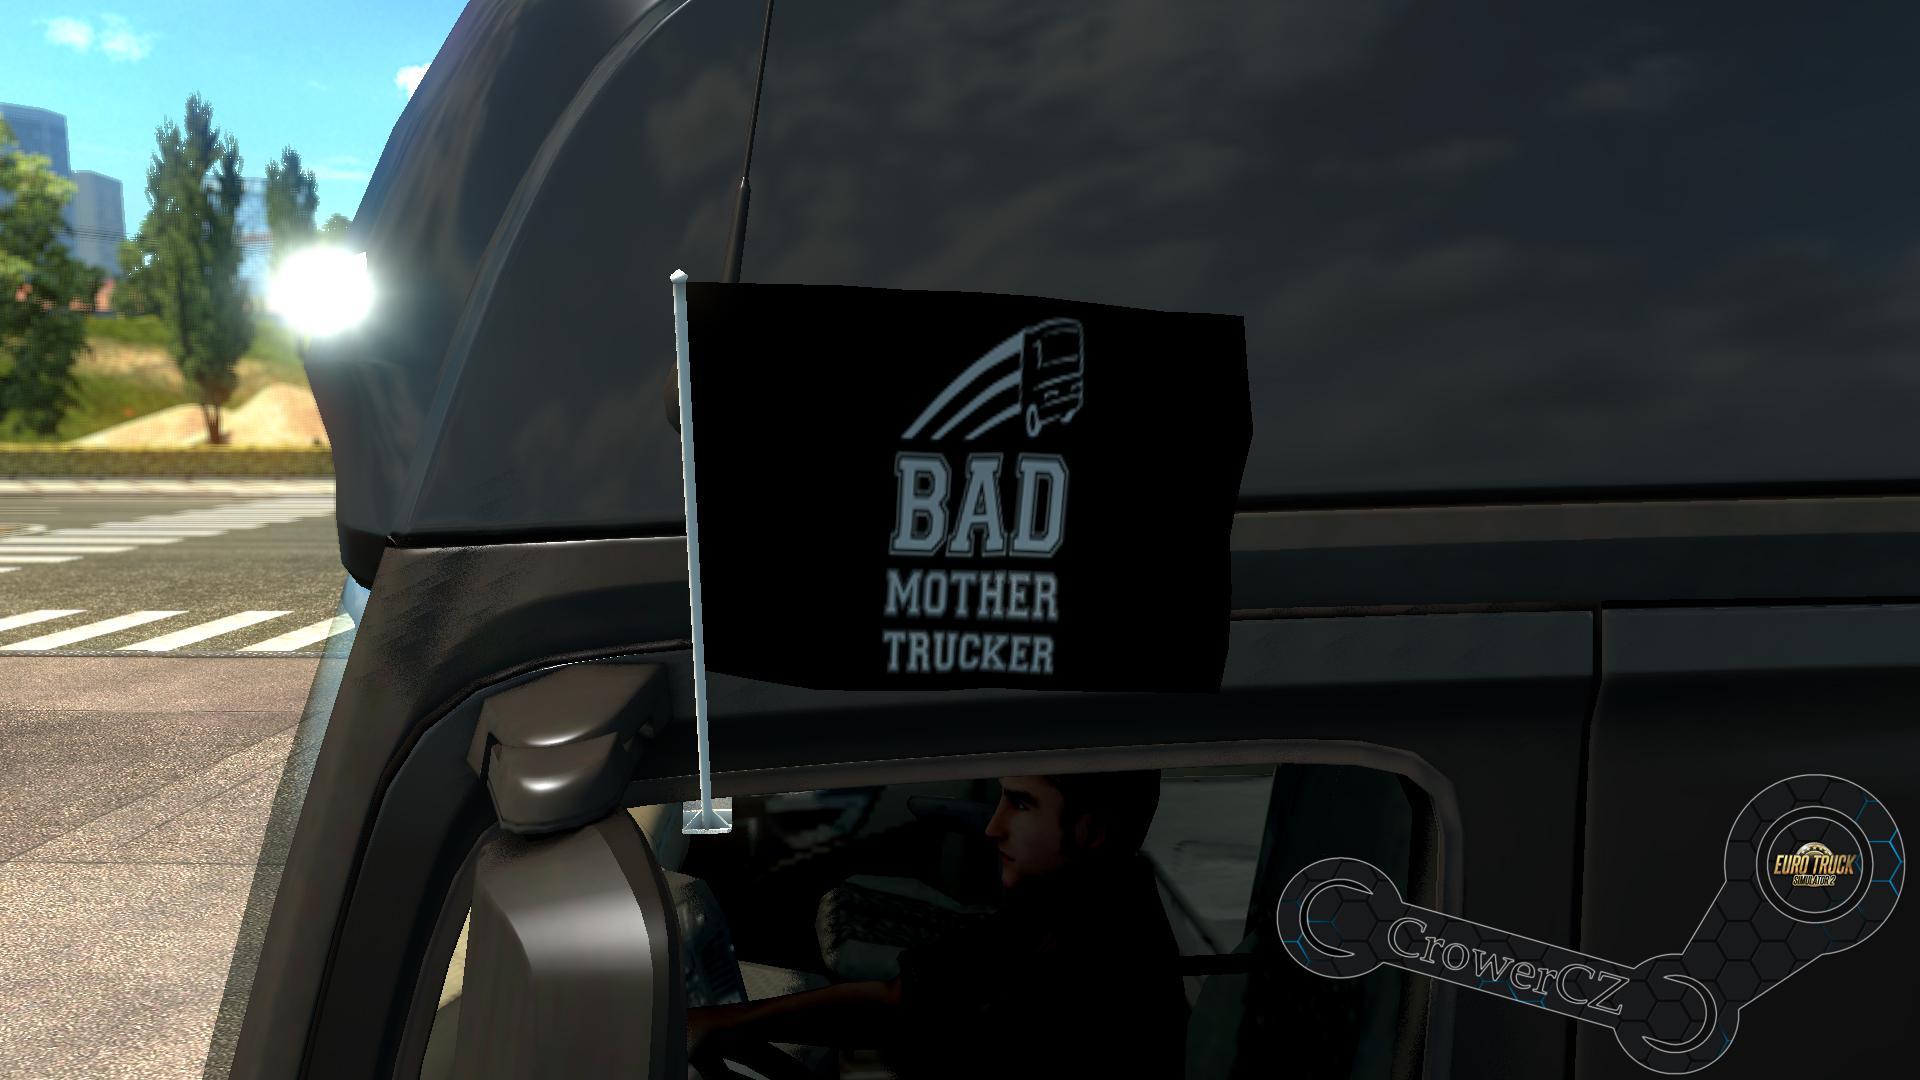 bad-mother-trucker-flags-1-24_1